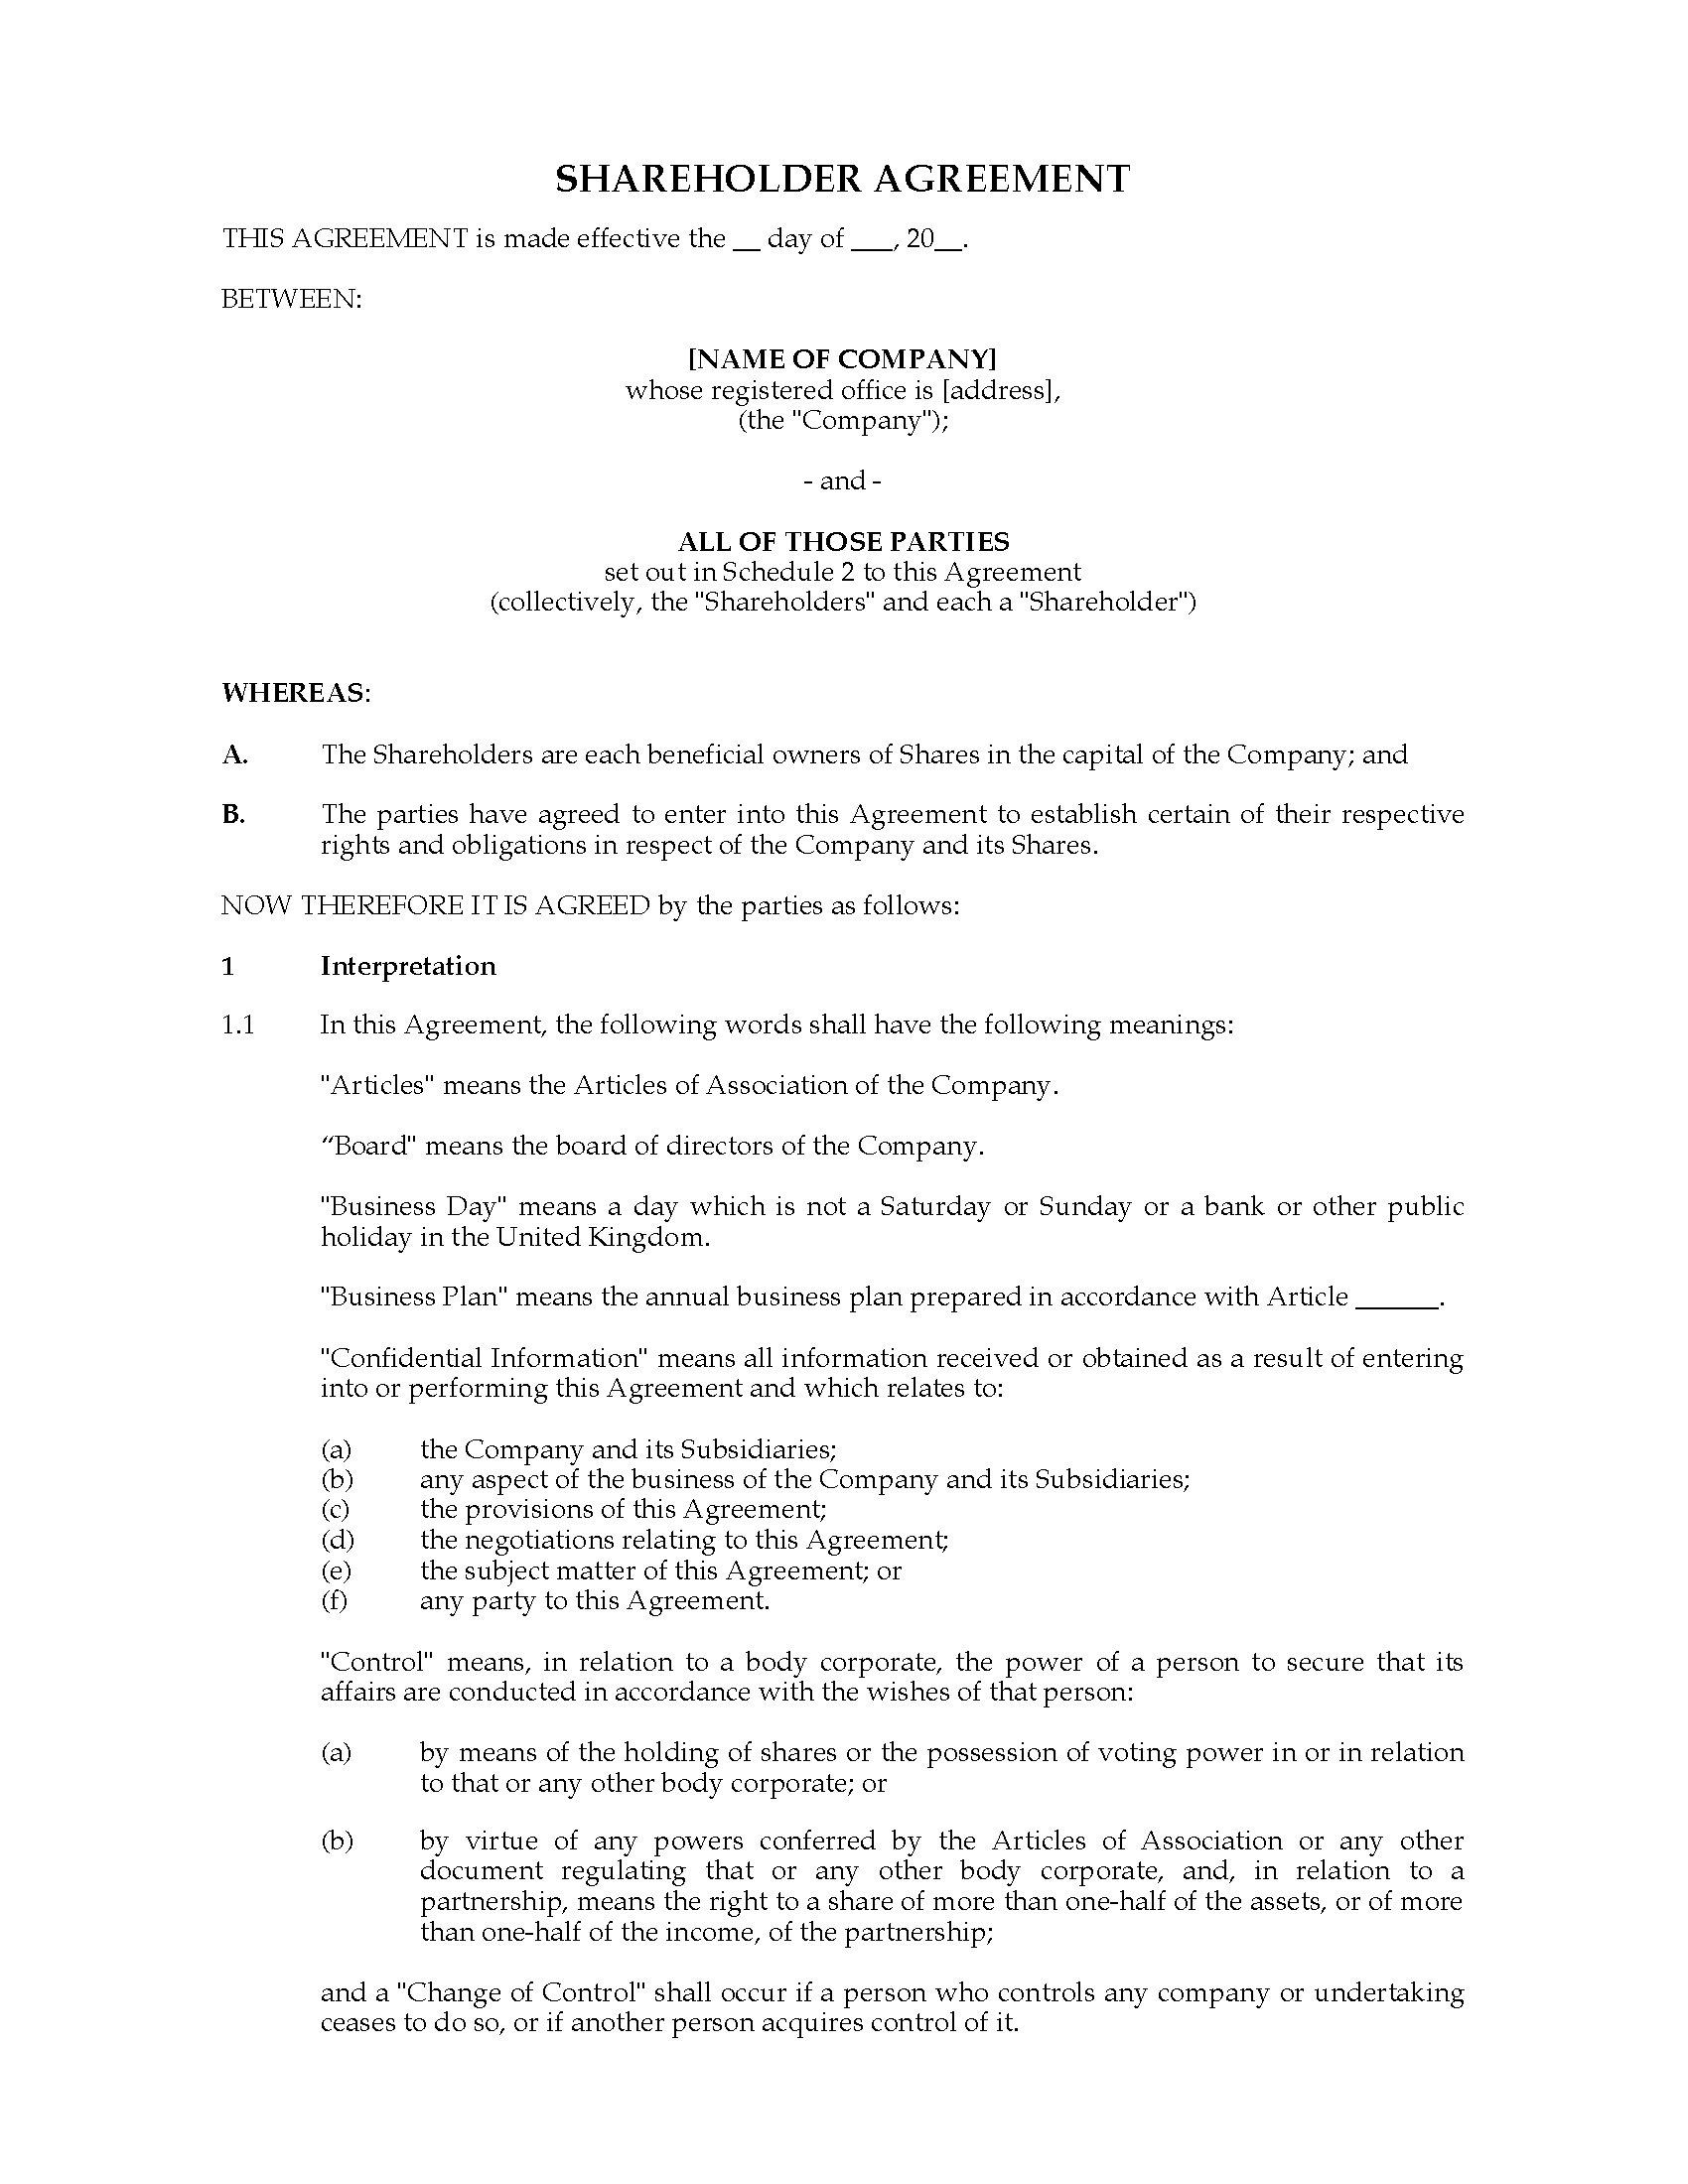 uk shareholder agreement legal forms and business templates. Black Bedroom Furniture Sets. Home Design Ideas